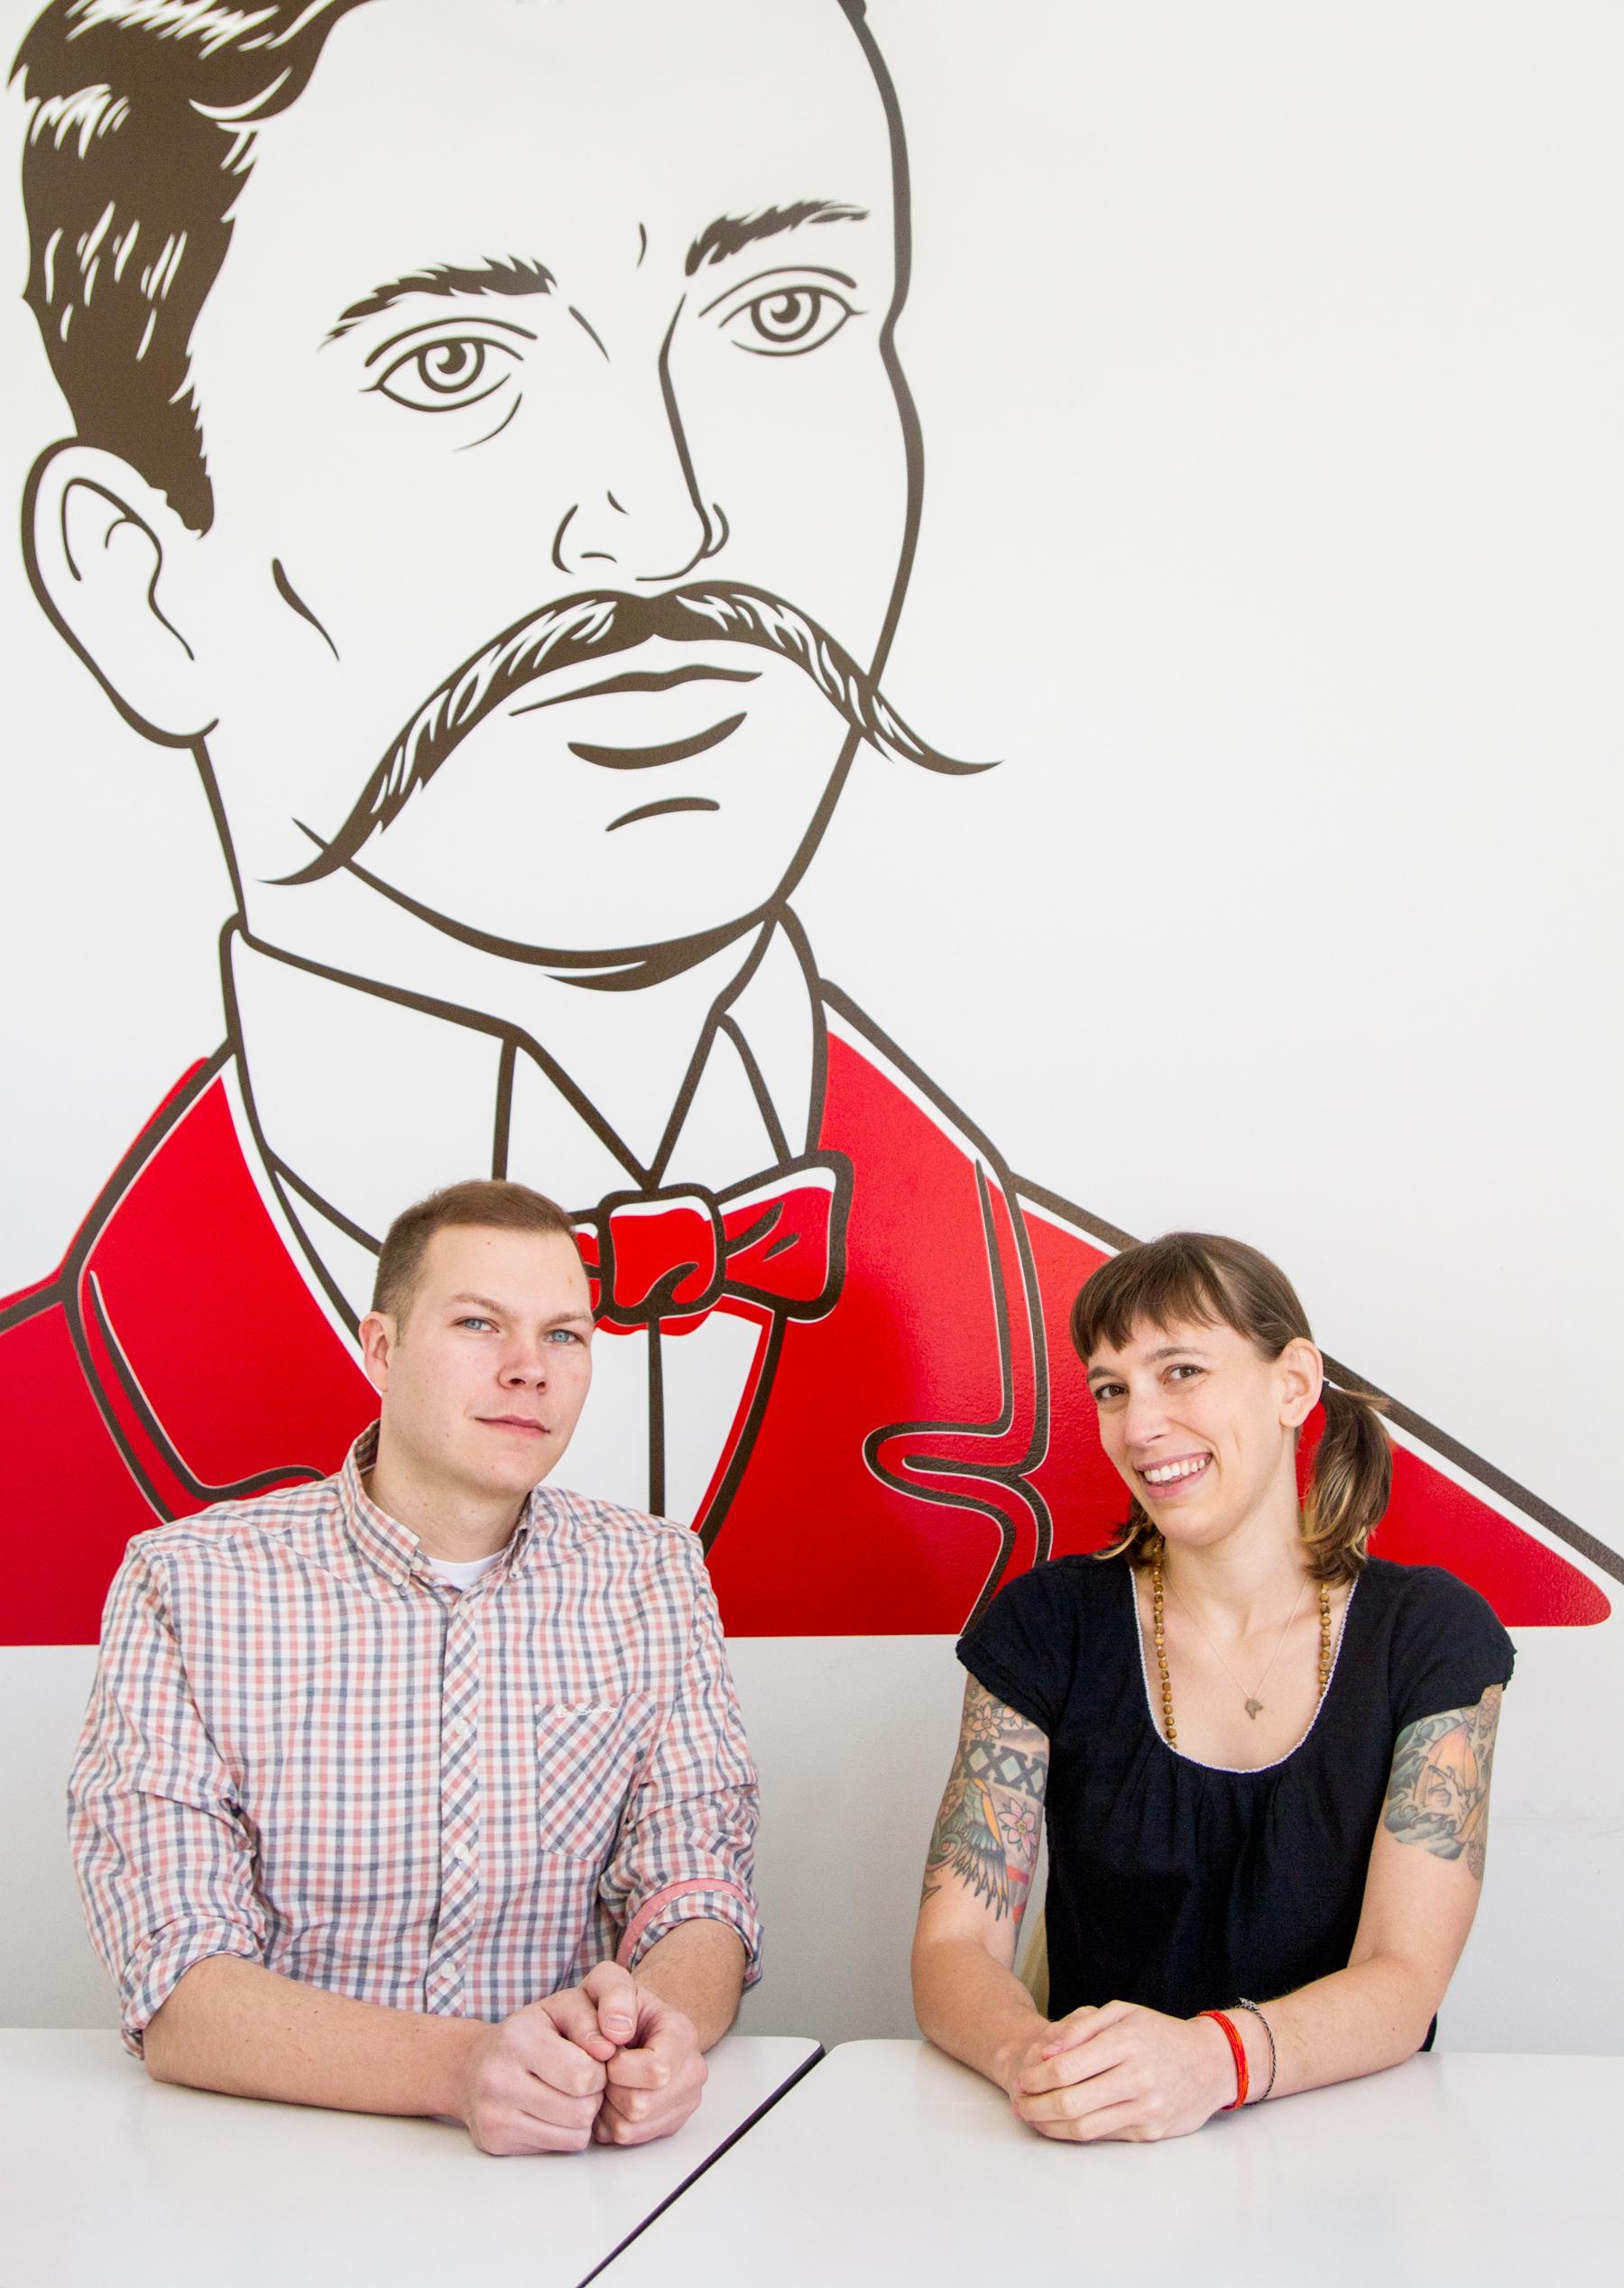 Daniel Staackmann and Nicole Sopko